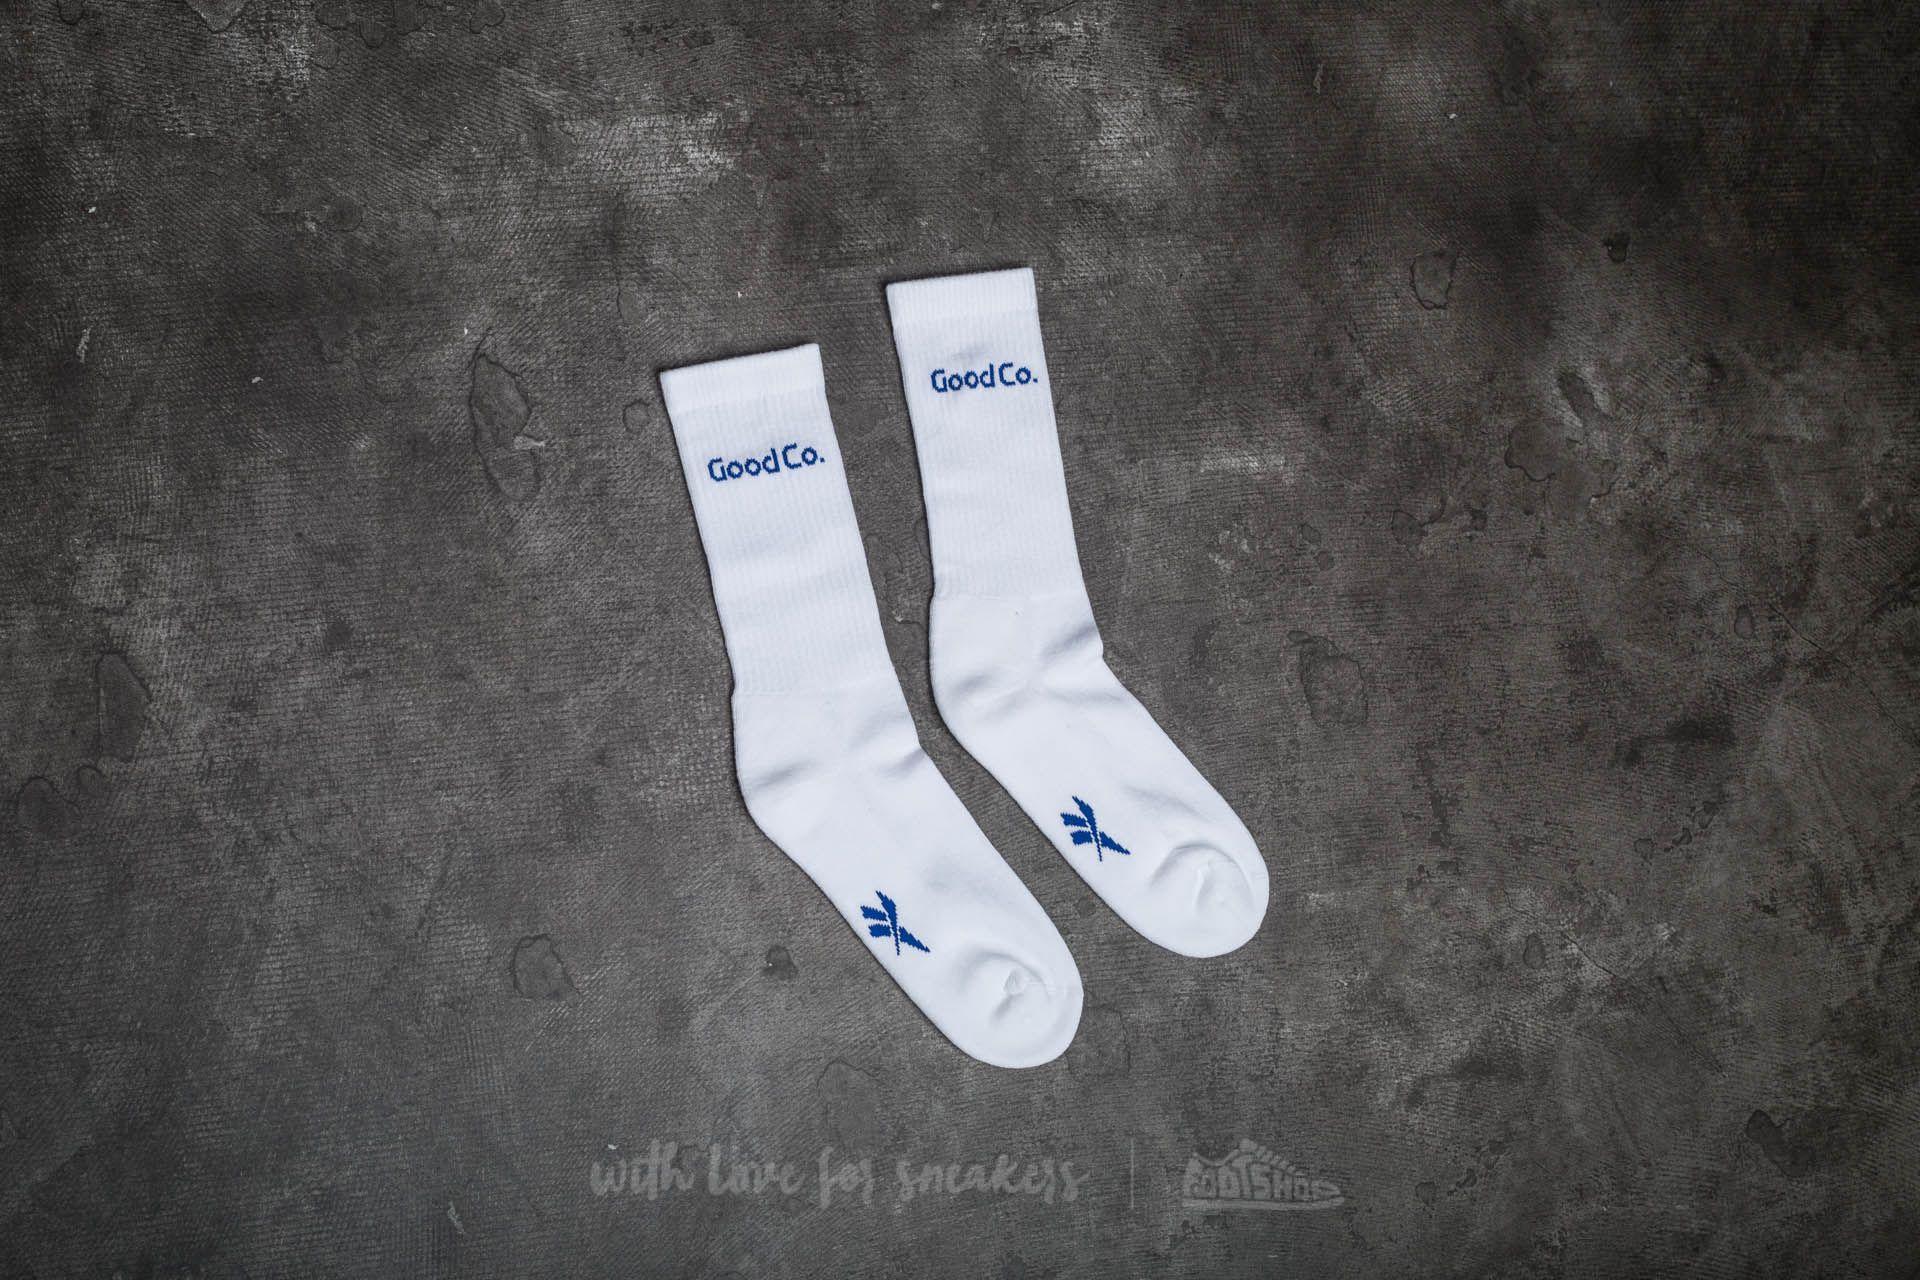 c8368013538 Reebok Classic x The Good Company Crew Socks White